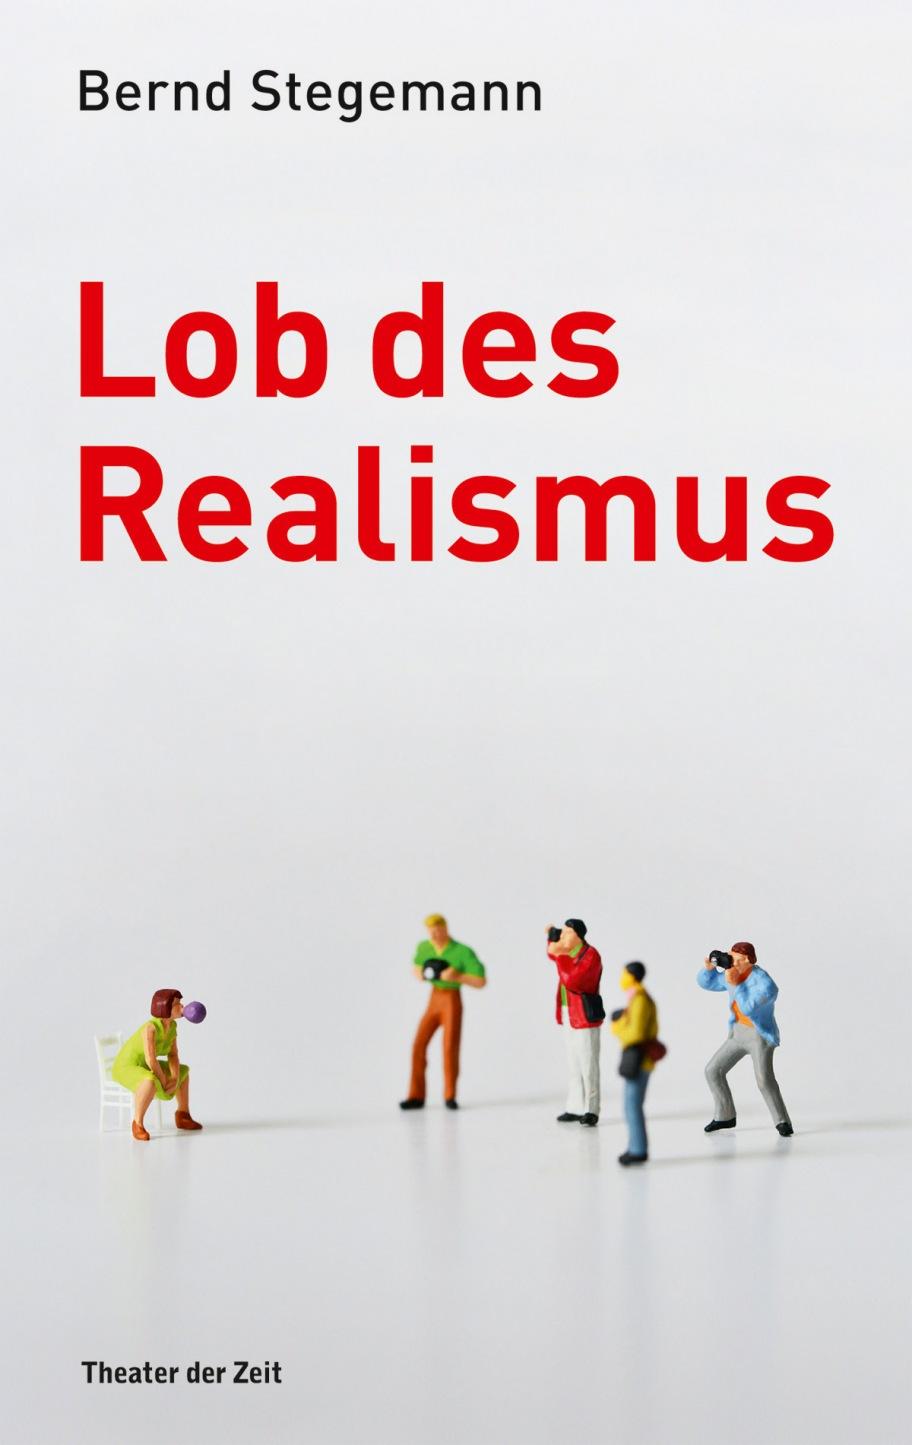 Bernd Stegemann: Lob des Realismus